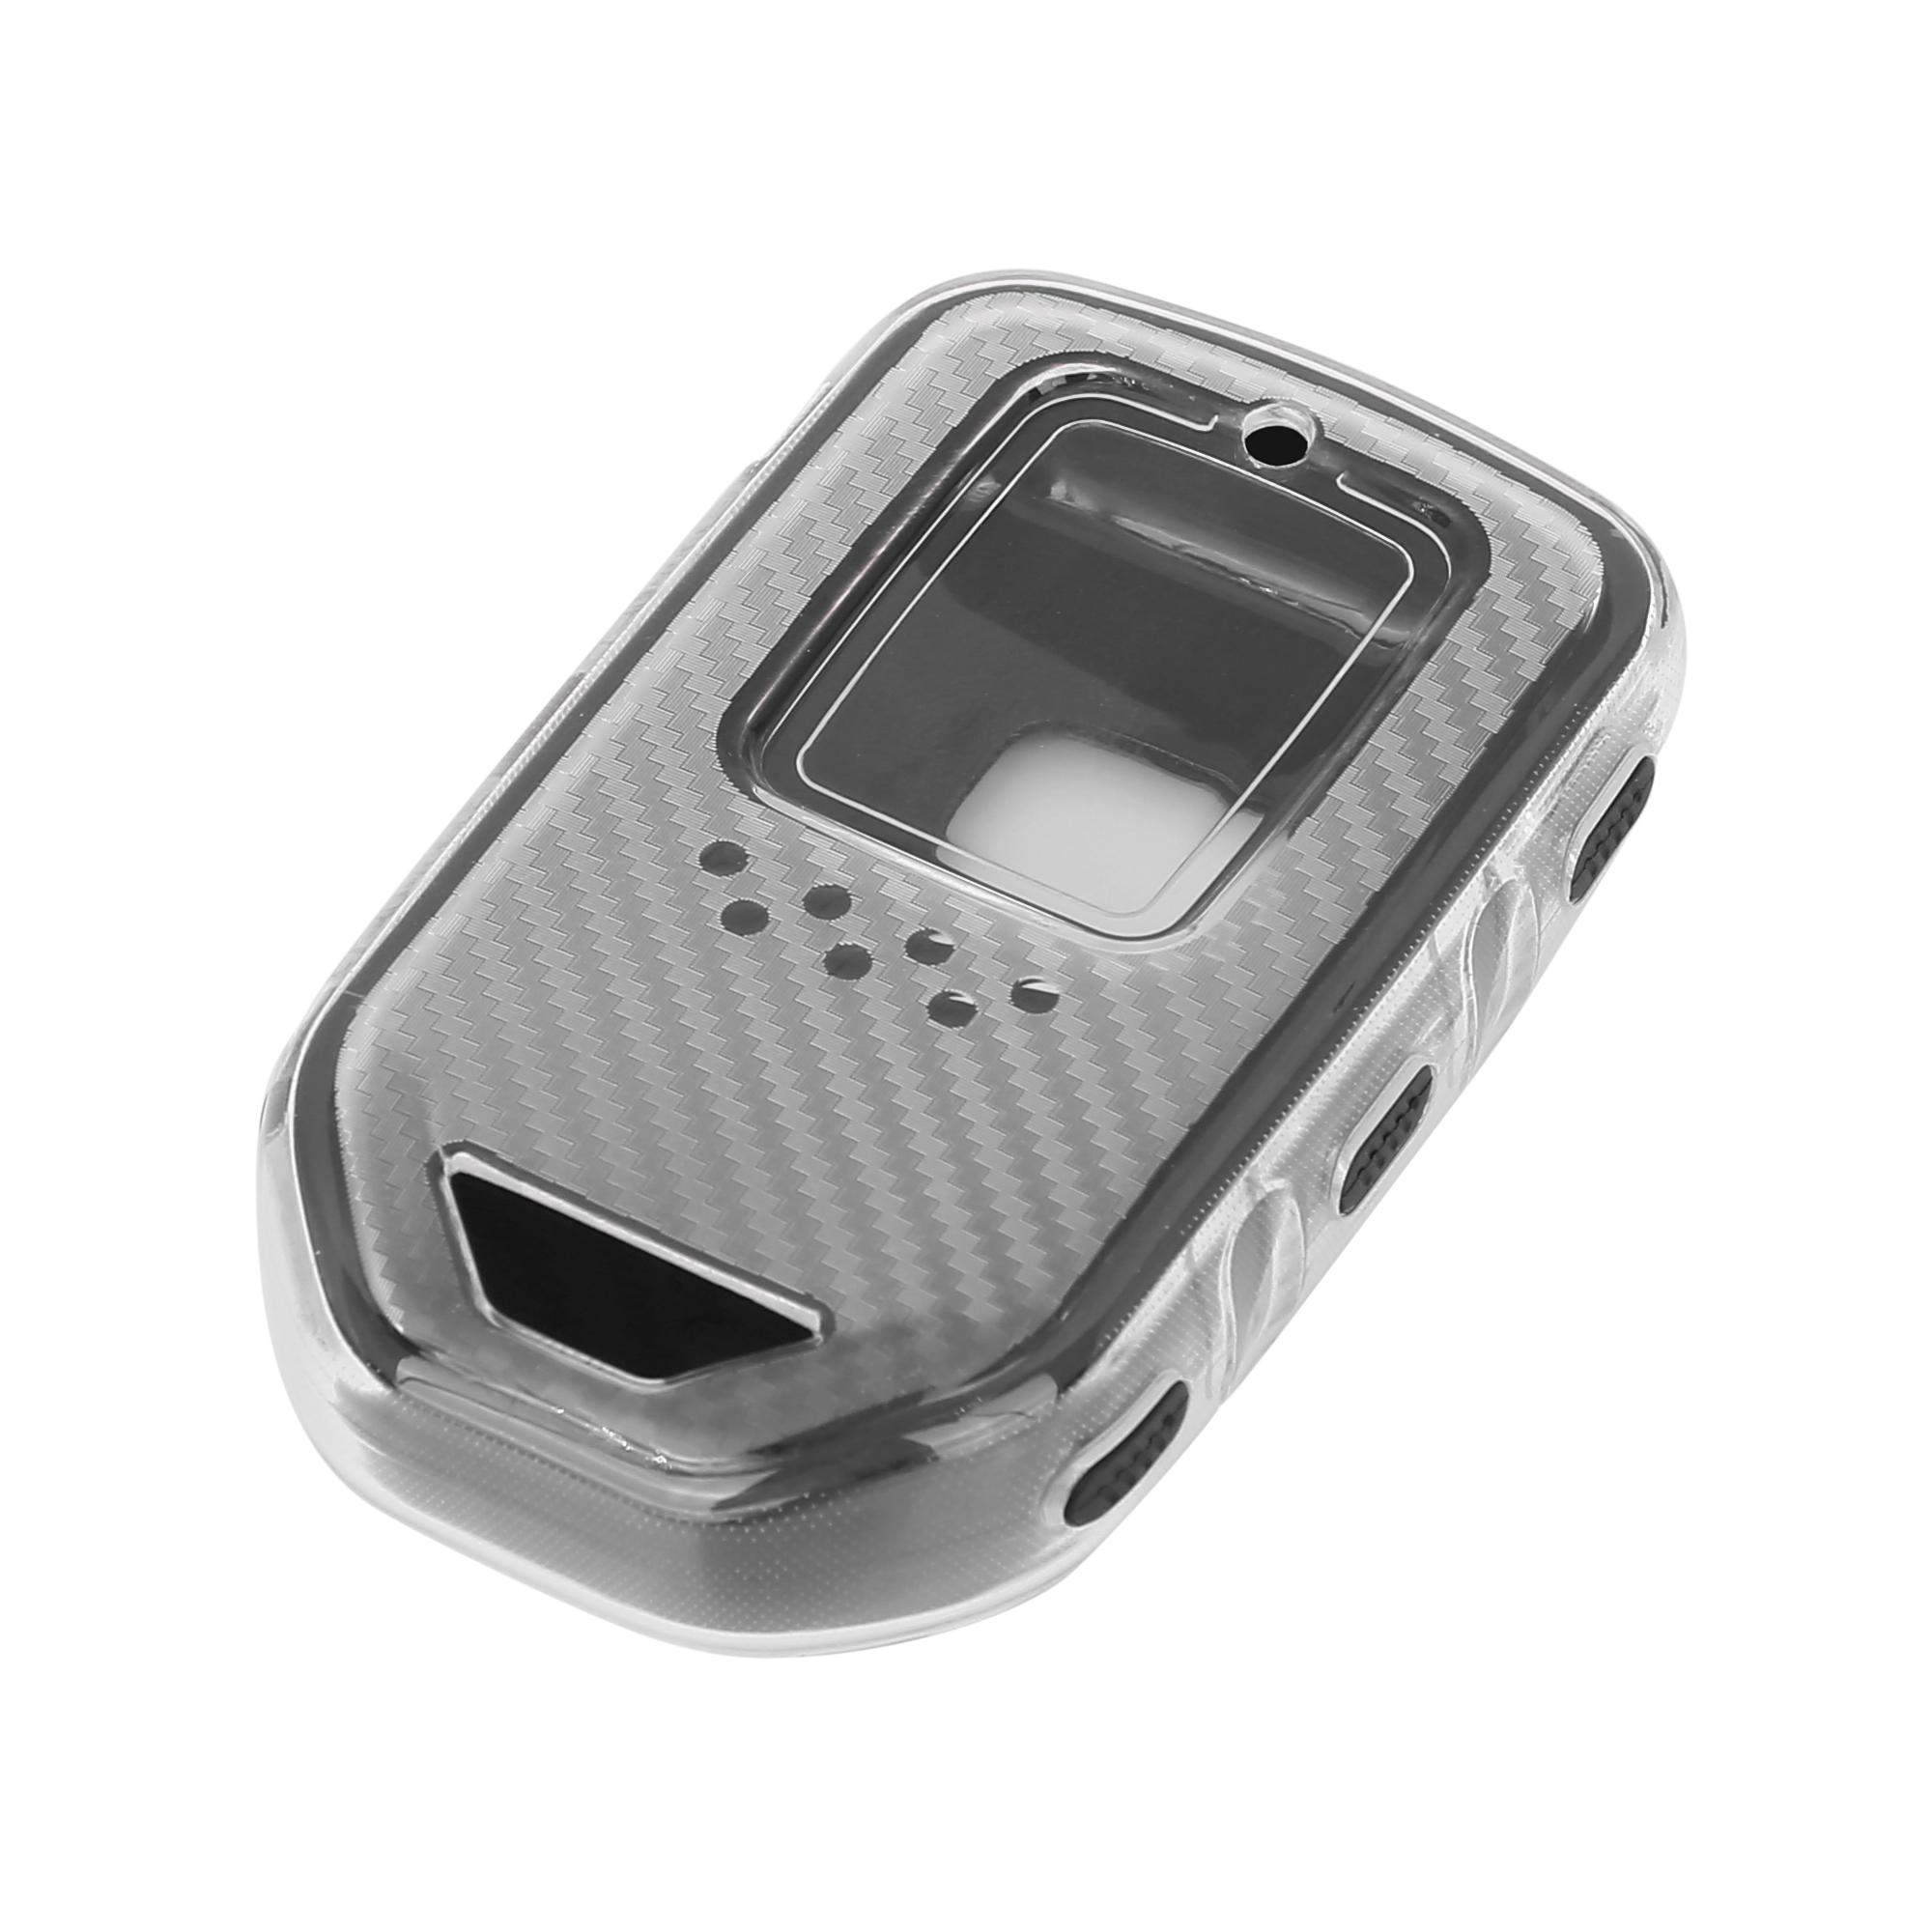 Keyless Remote Key Case Key Fob Shell Cover Case for Honda Accord Civic Black